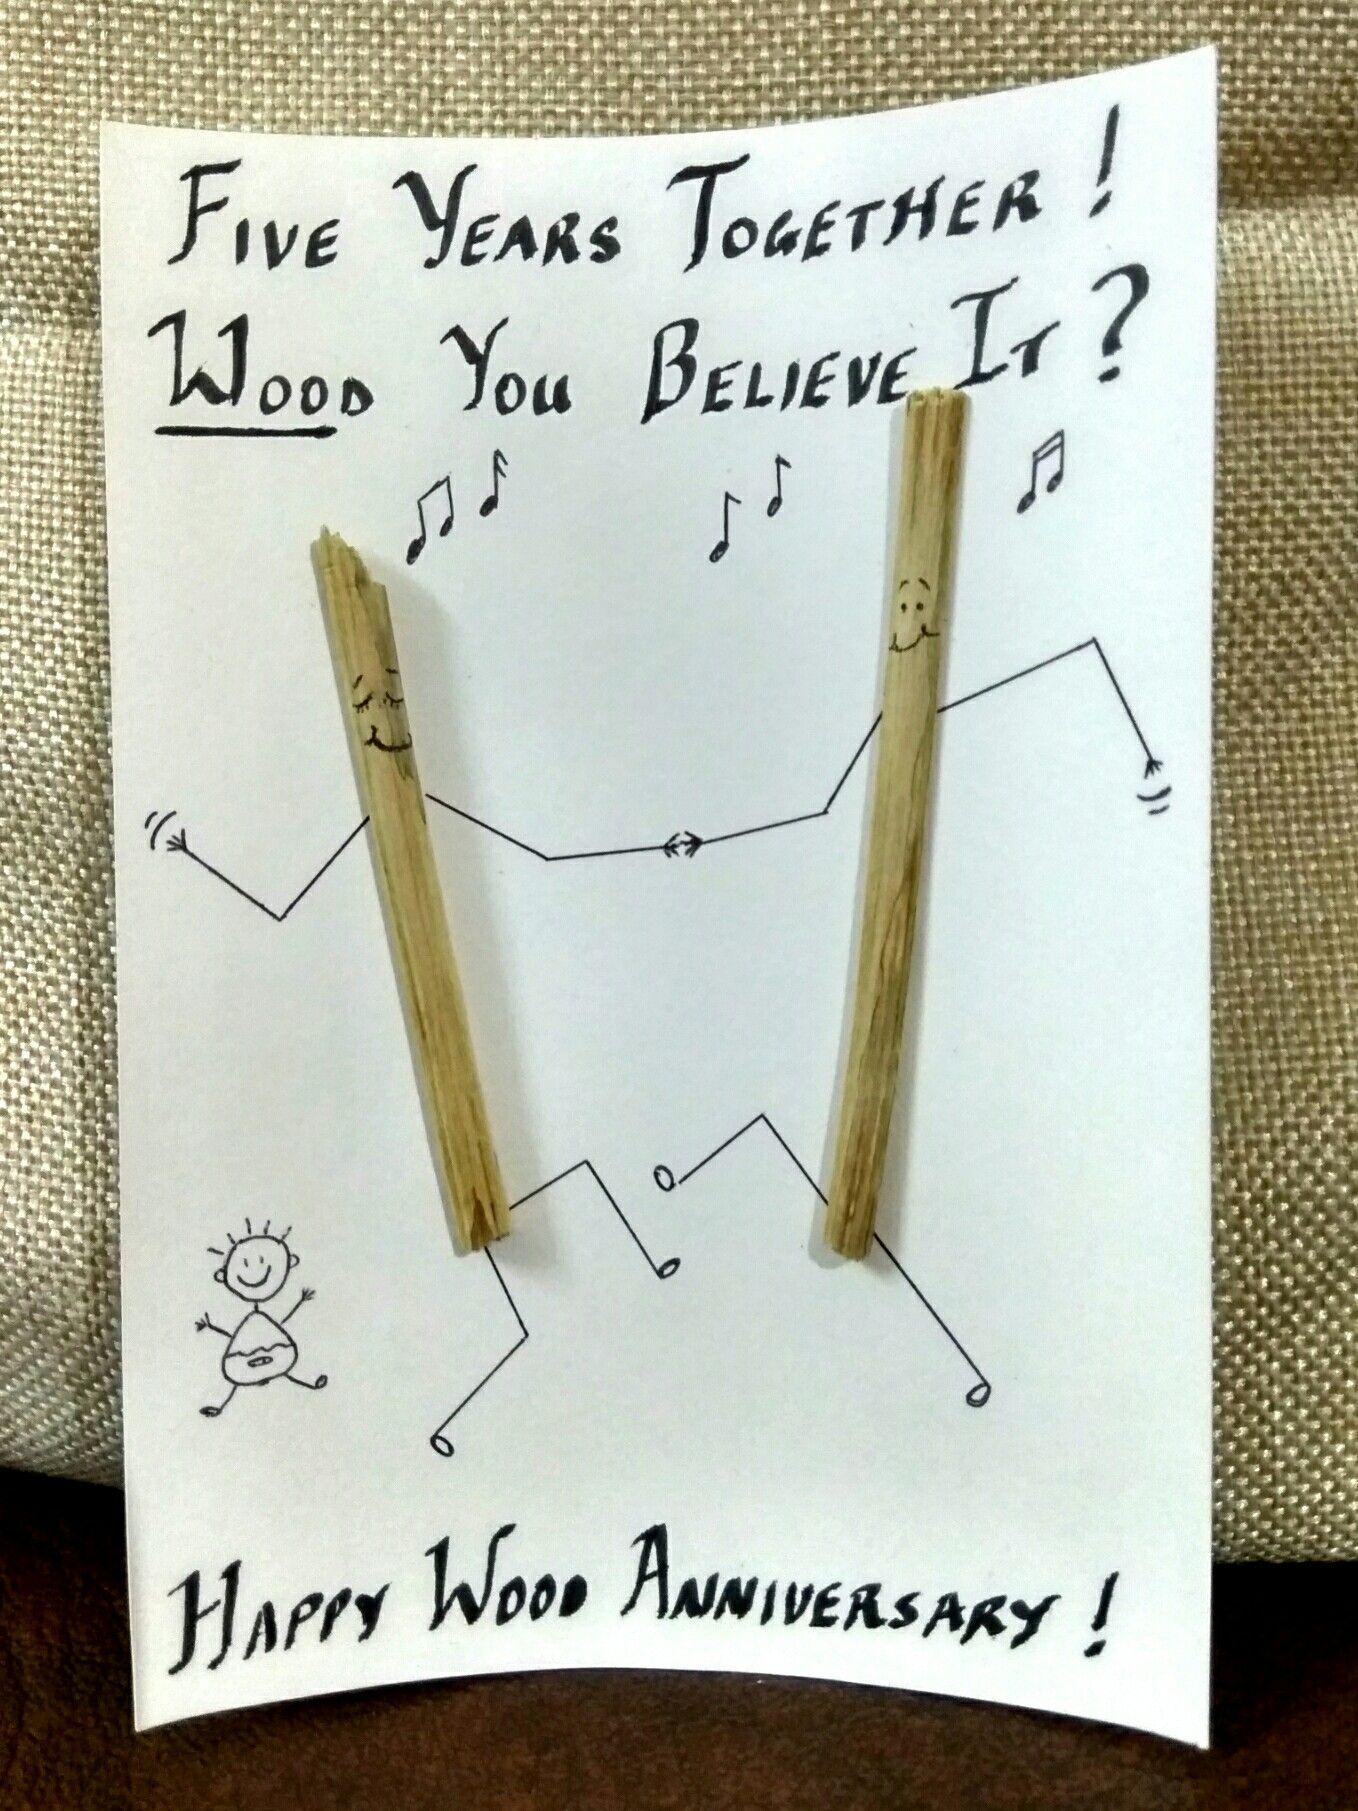 Diy Wood Anniversary Card 5th Wedding Anniversary Card Wood Stick Figure Puns Diy Anniversar Wood Anniversary Wedding Anniversary Cards Anniversary Diy